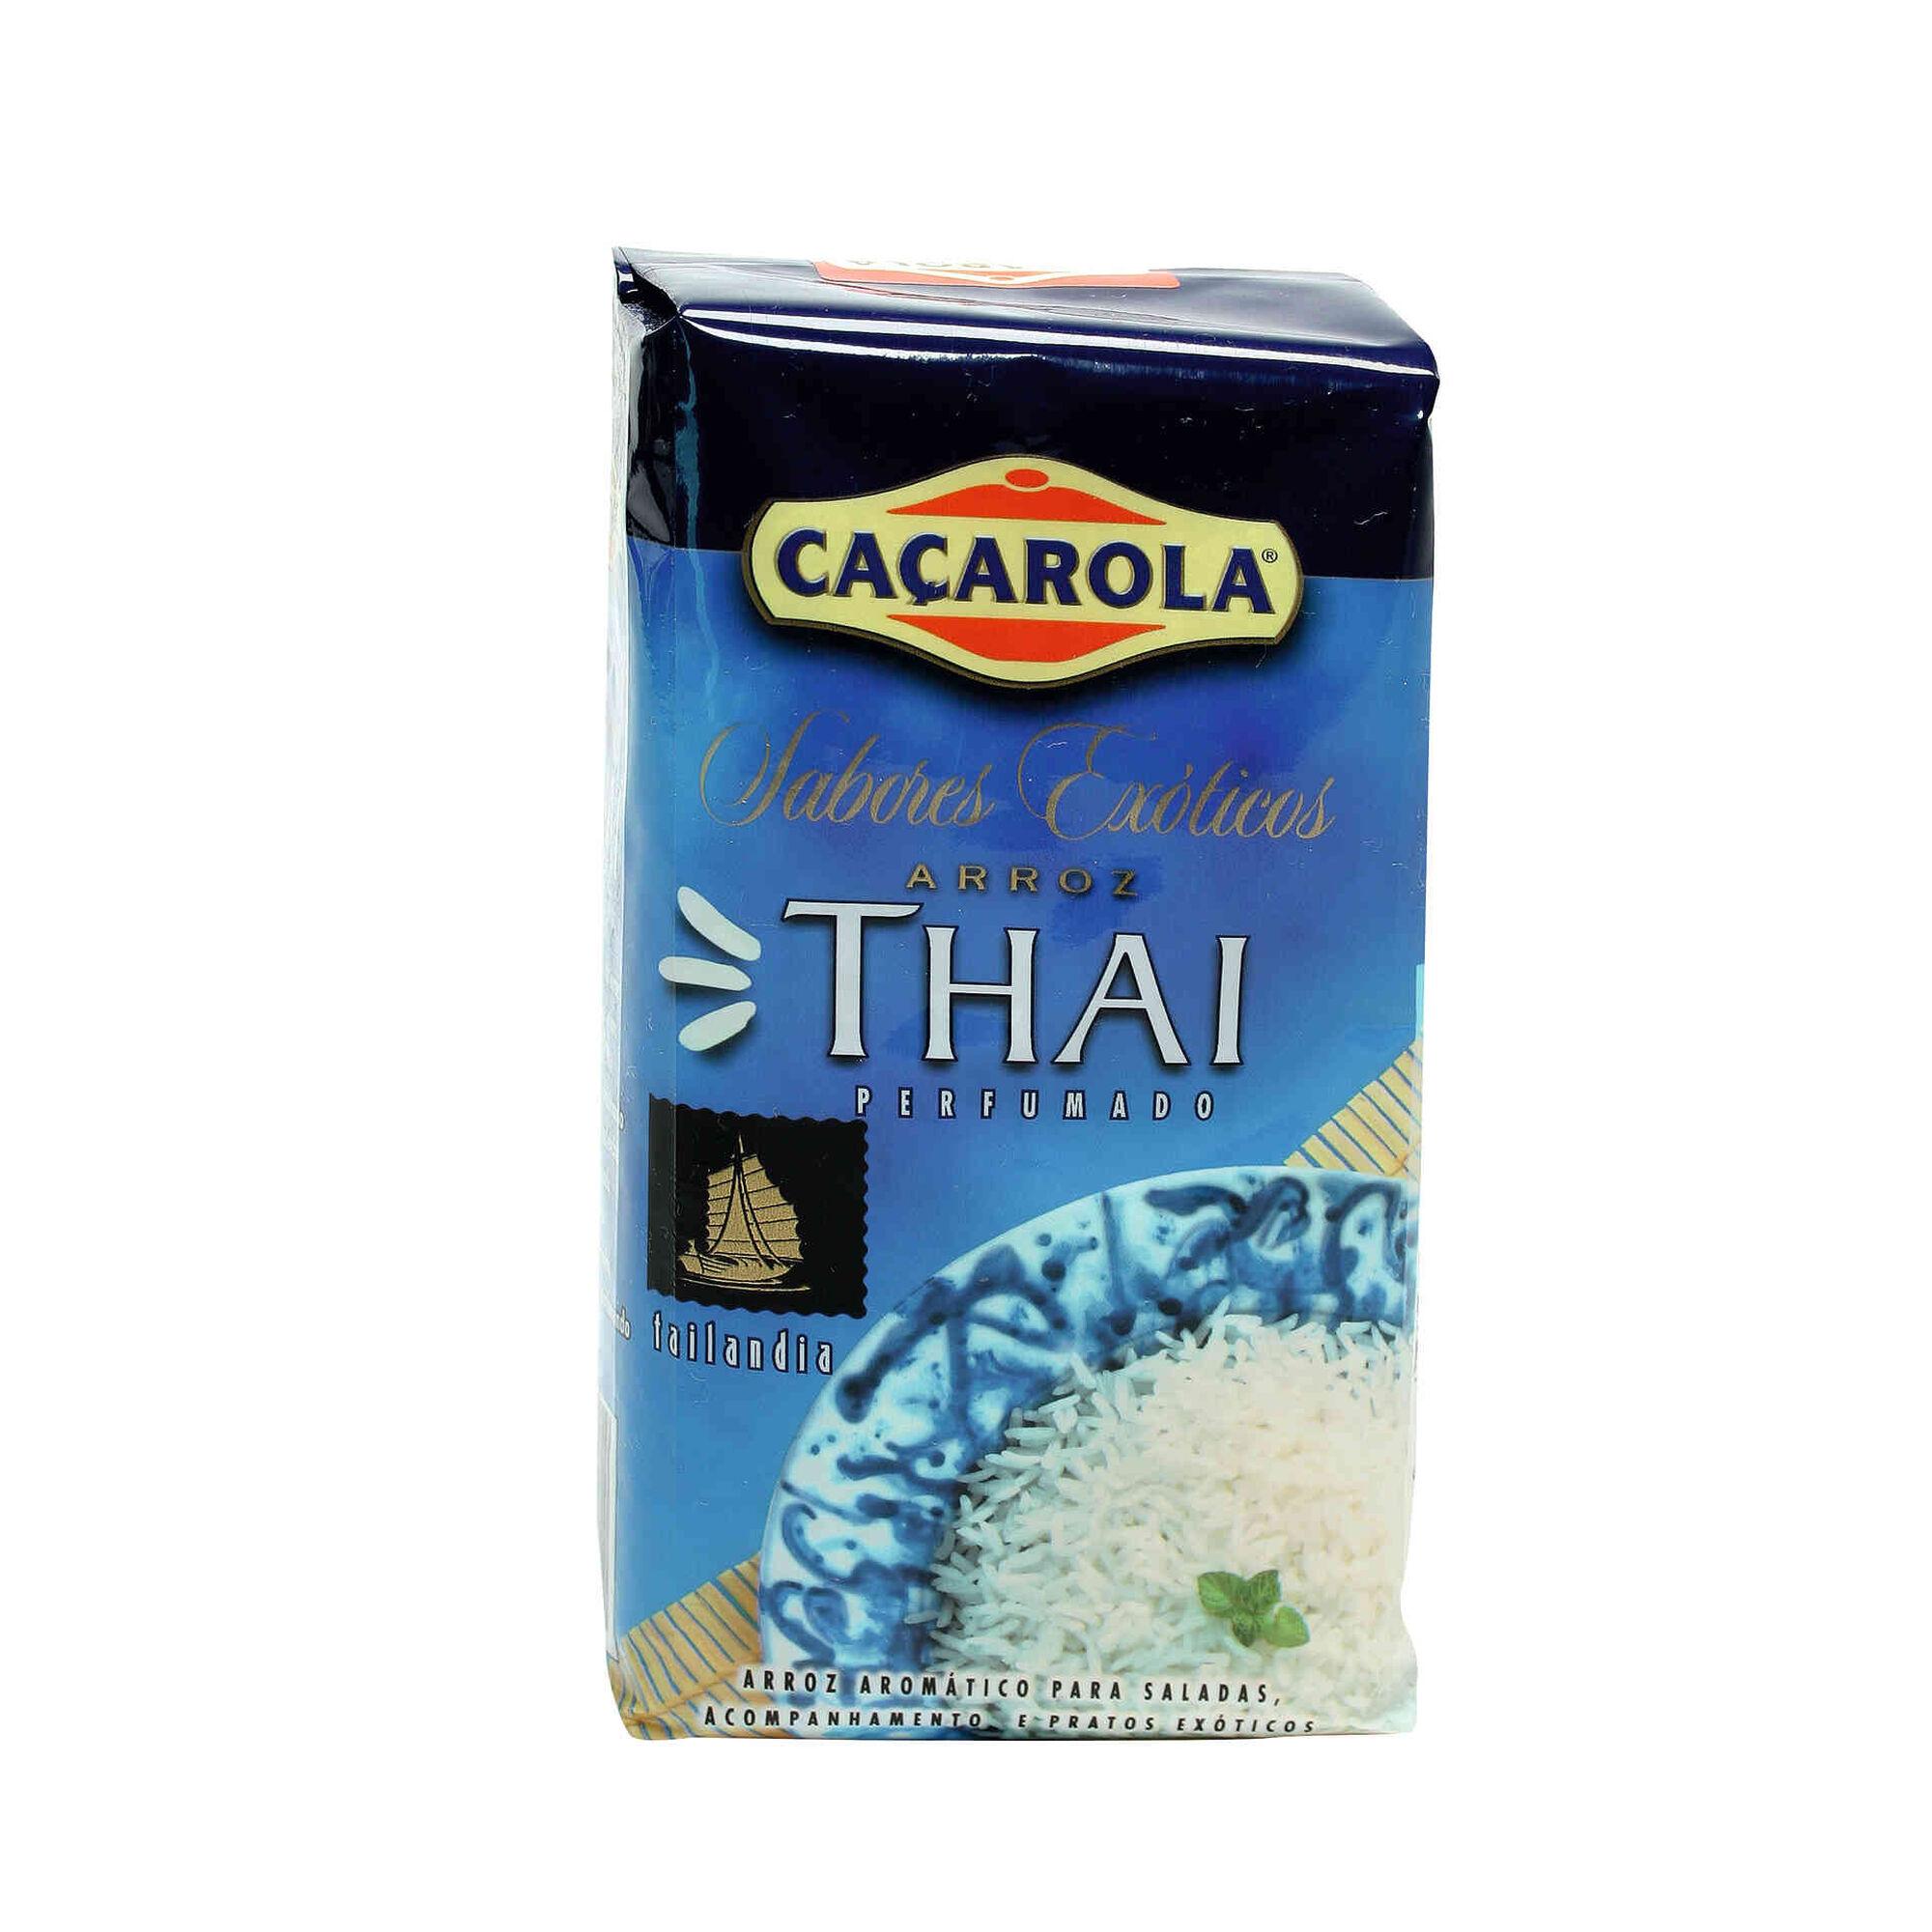 Arroz Thai Perfumado